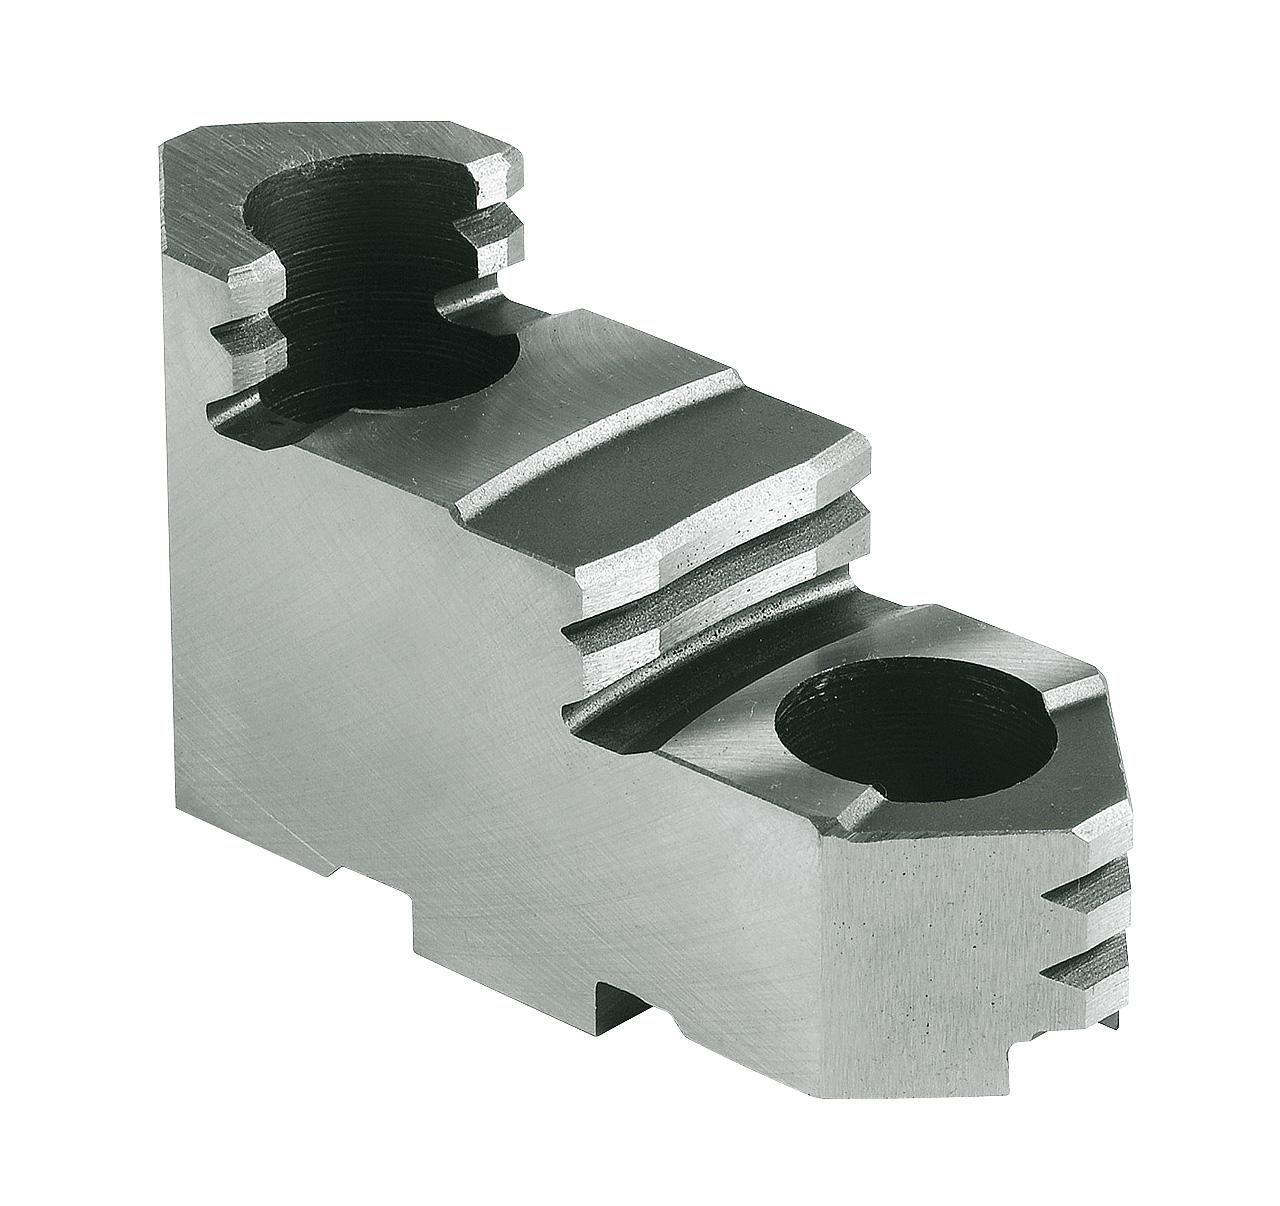 Szczęki górne twarde - komplet DTJ-DK12-125 BERNARDO